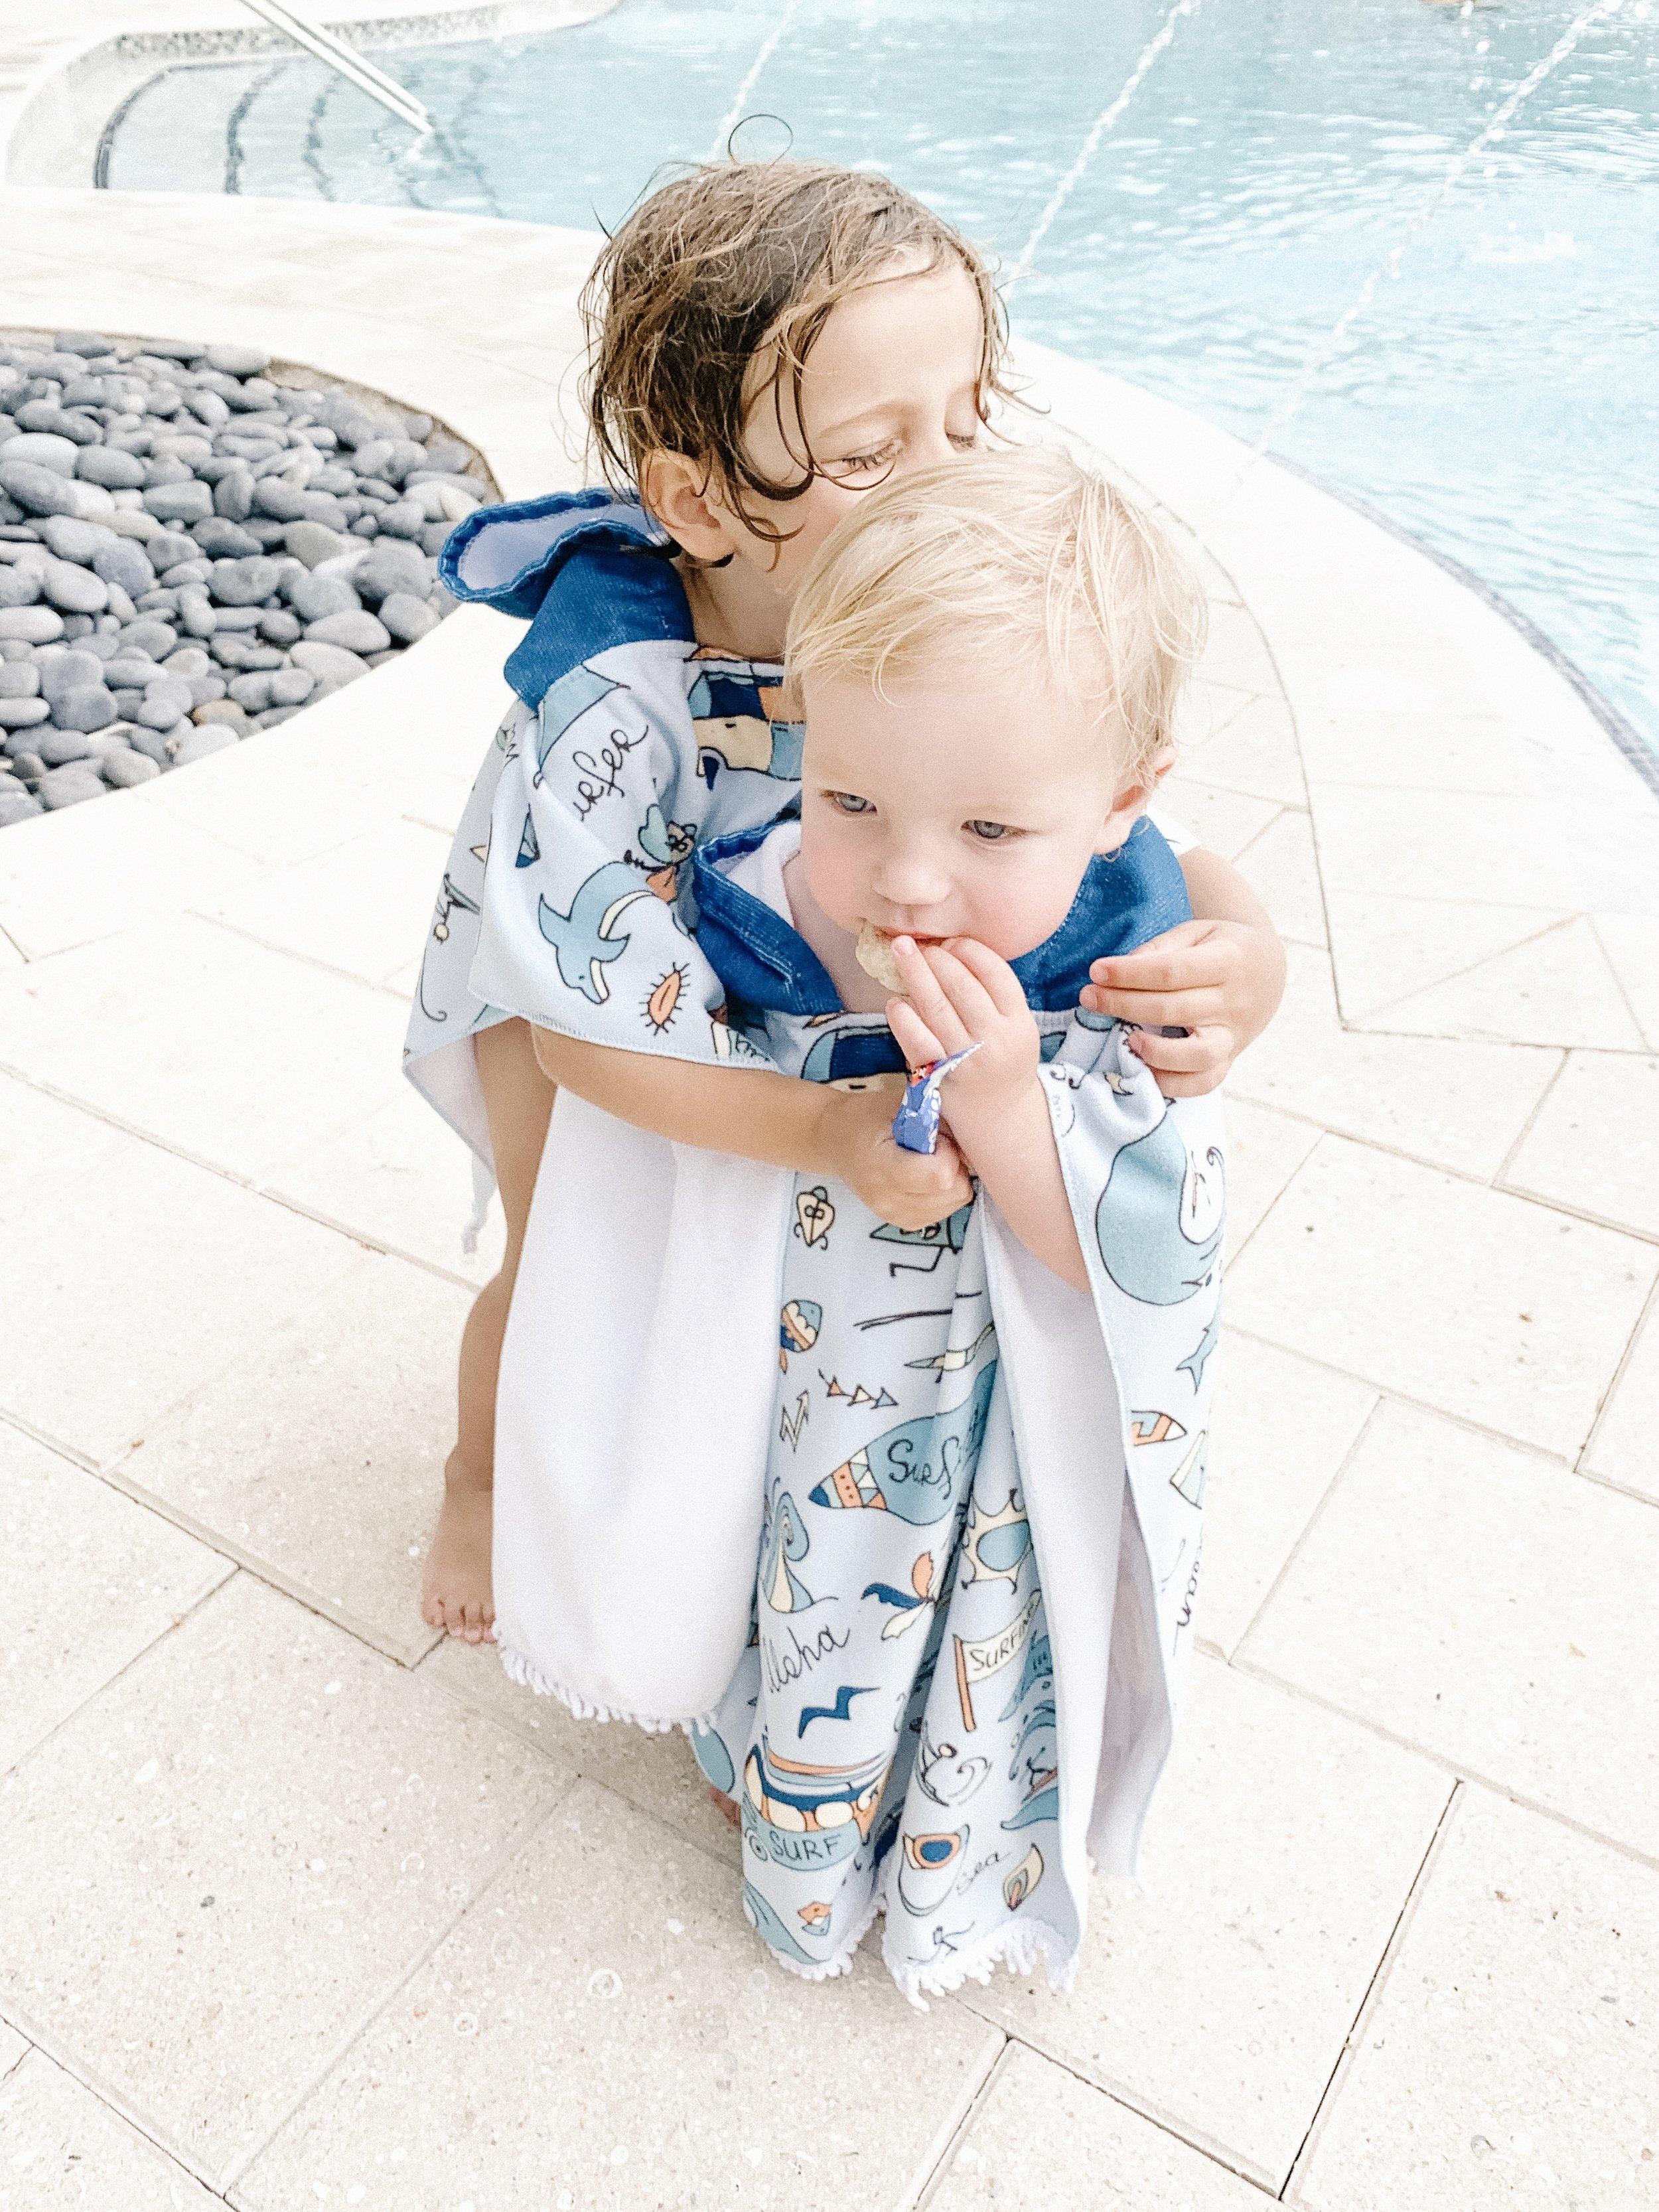 Summer Pool Bag Essentials